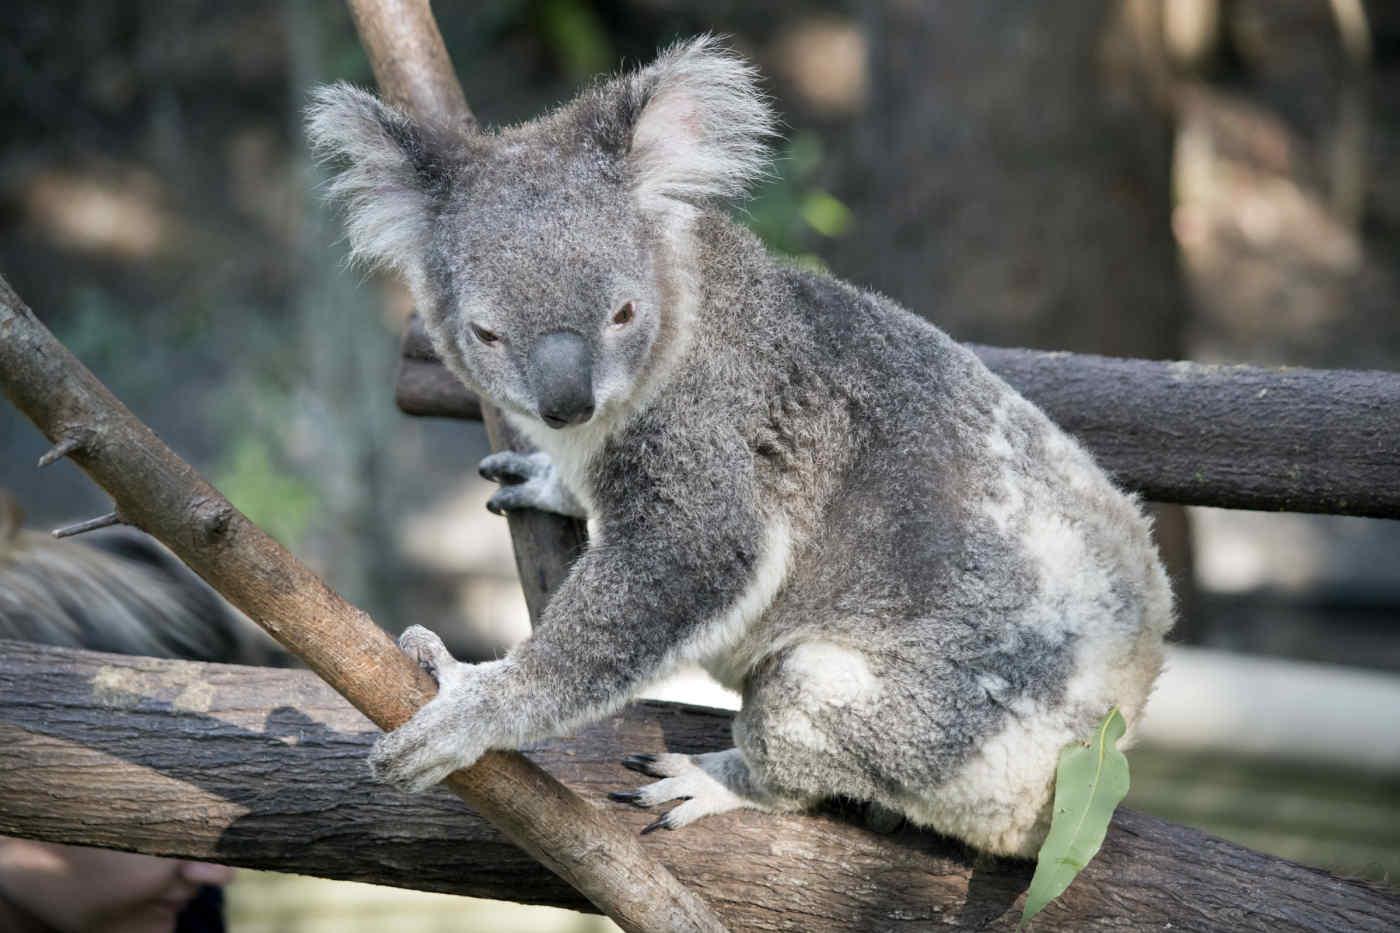 Know Before You Go: Australian Drop Bears